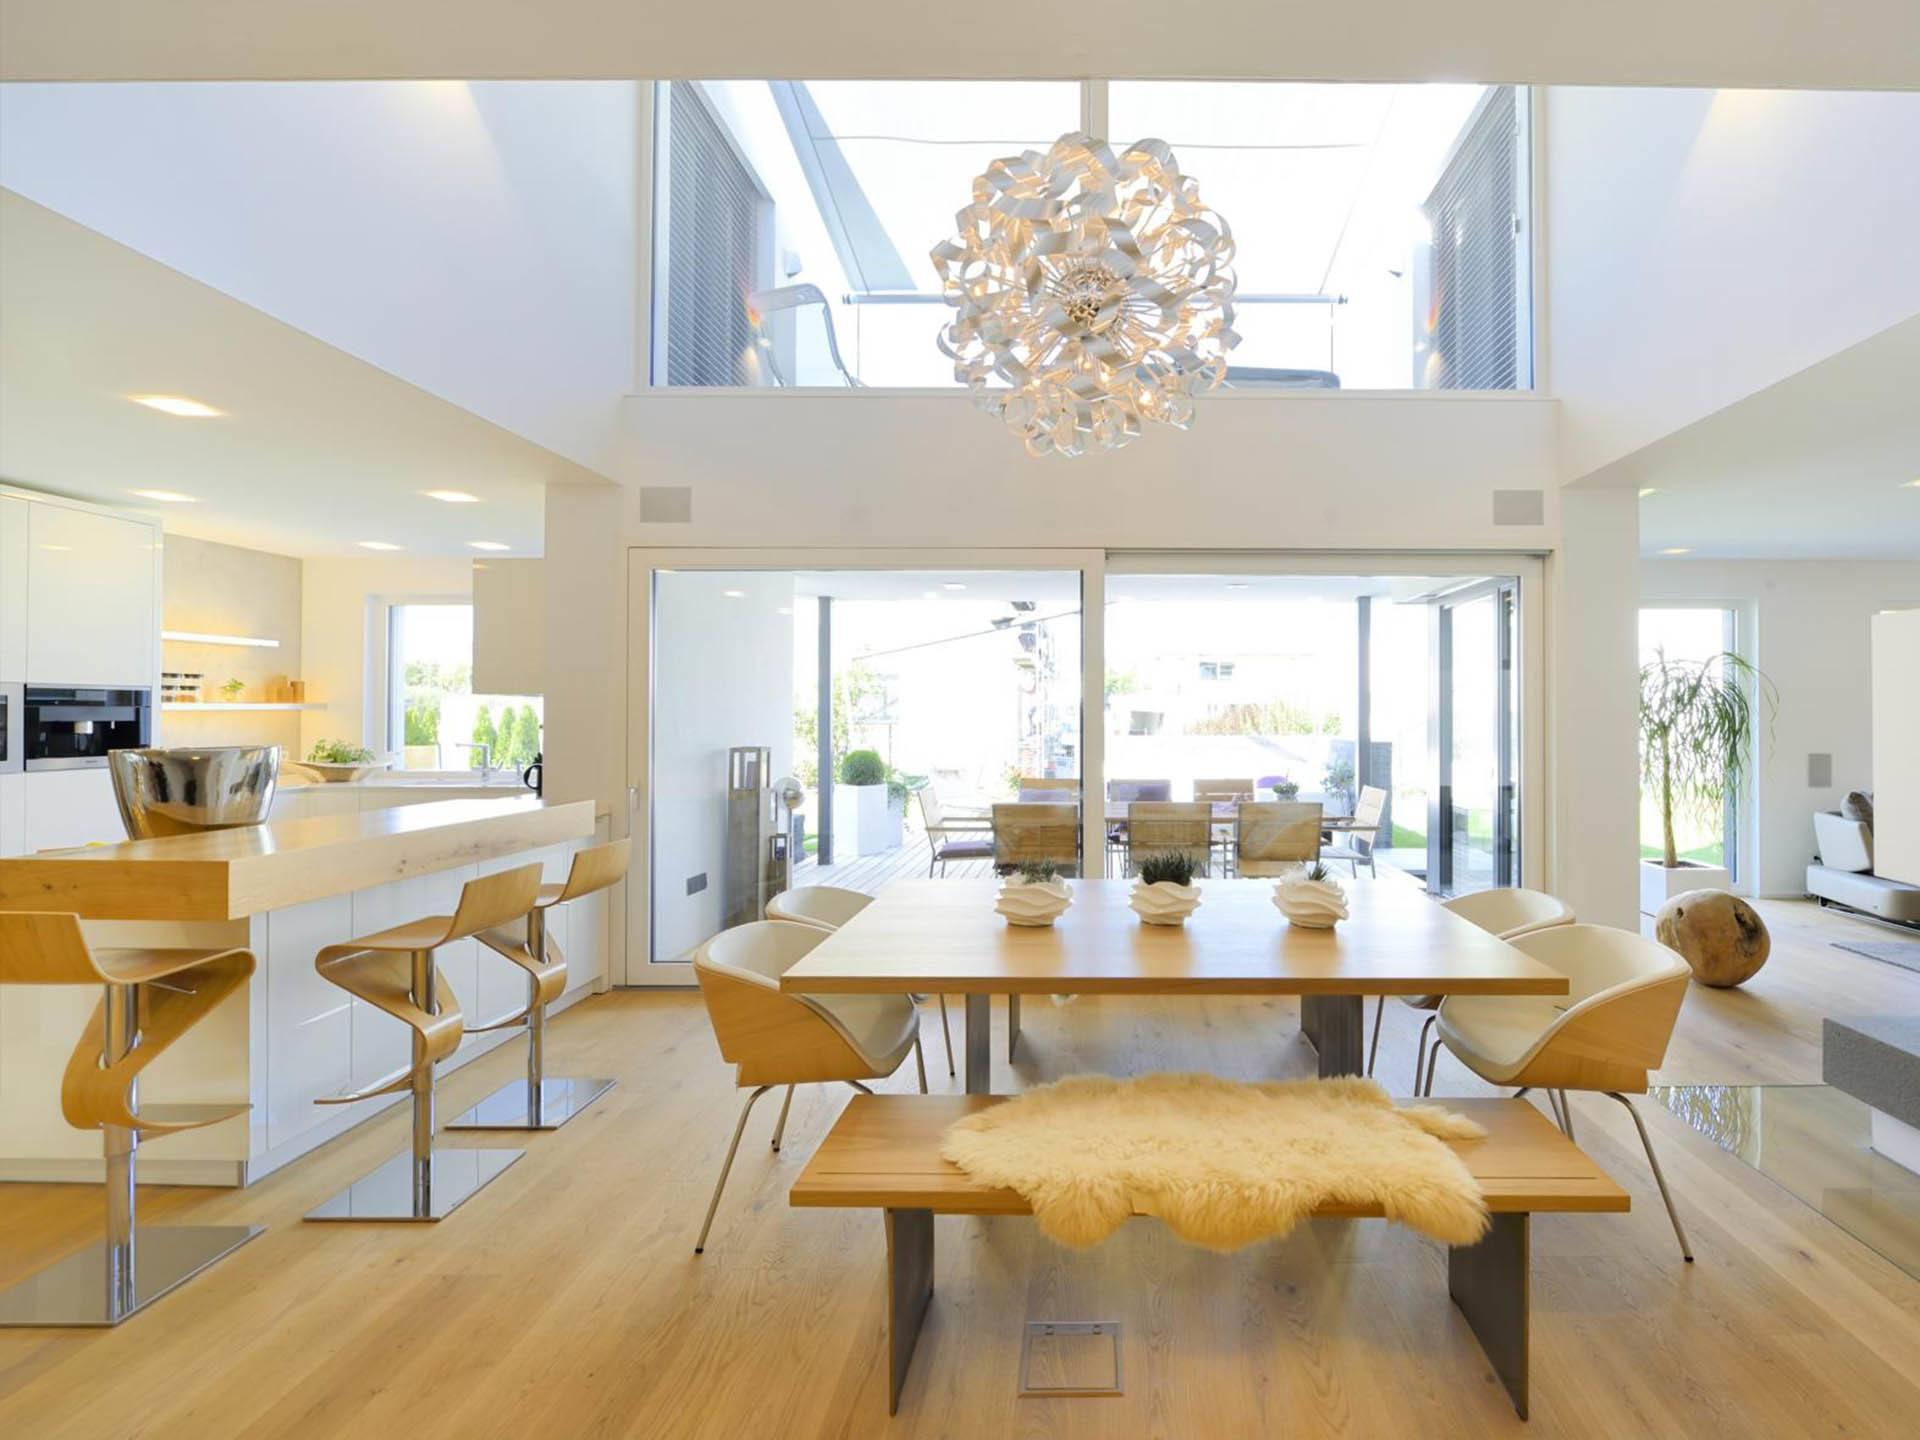 haus reichenbach gruber holzhaus. Black Bedroom Furniture Sets. Home Design Ideas